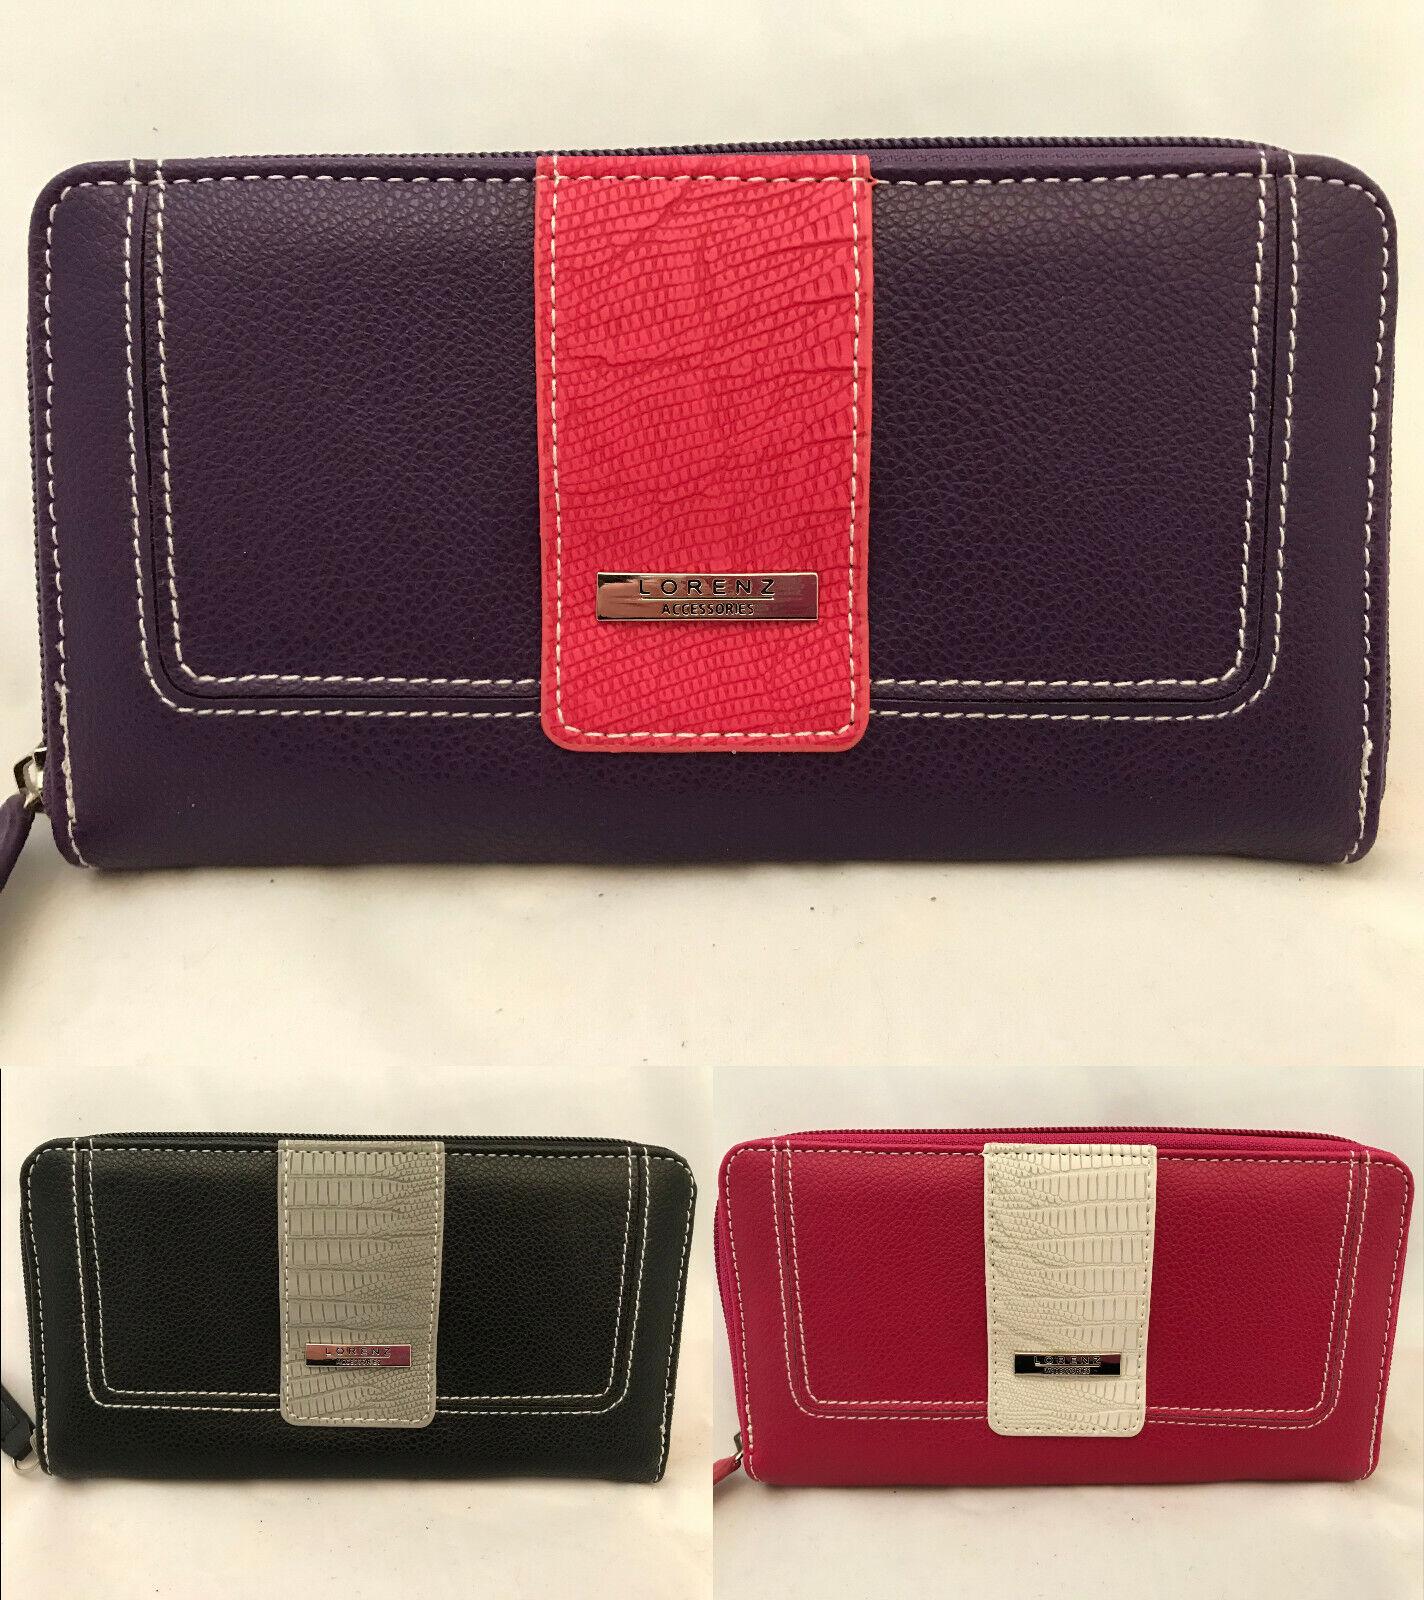 Lorenz Leather Grain PU Zip Round Purse / Card Holder. 3 Colours